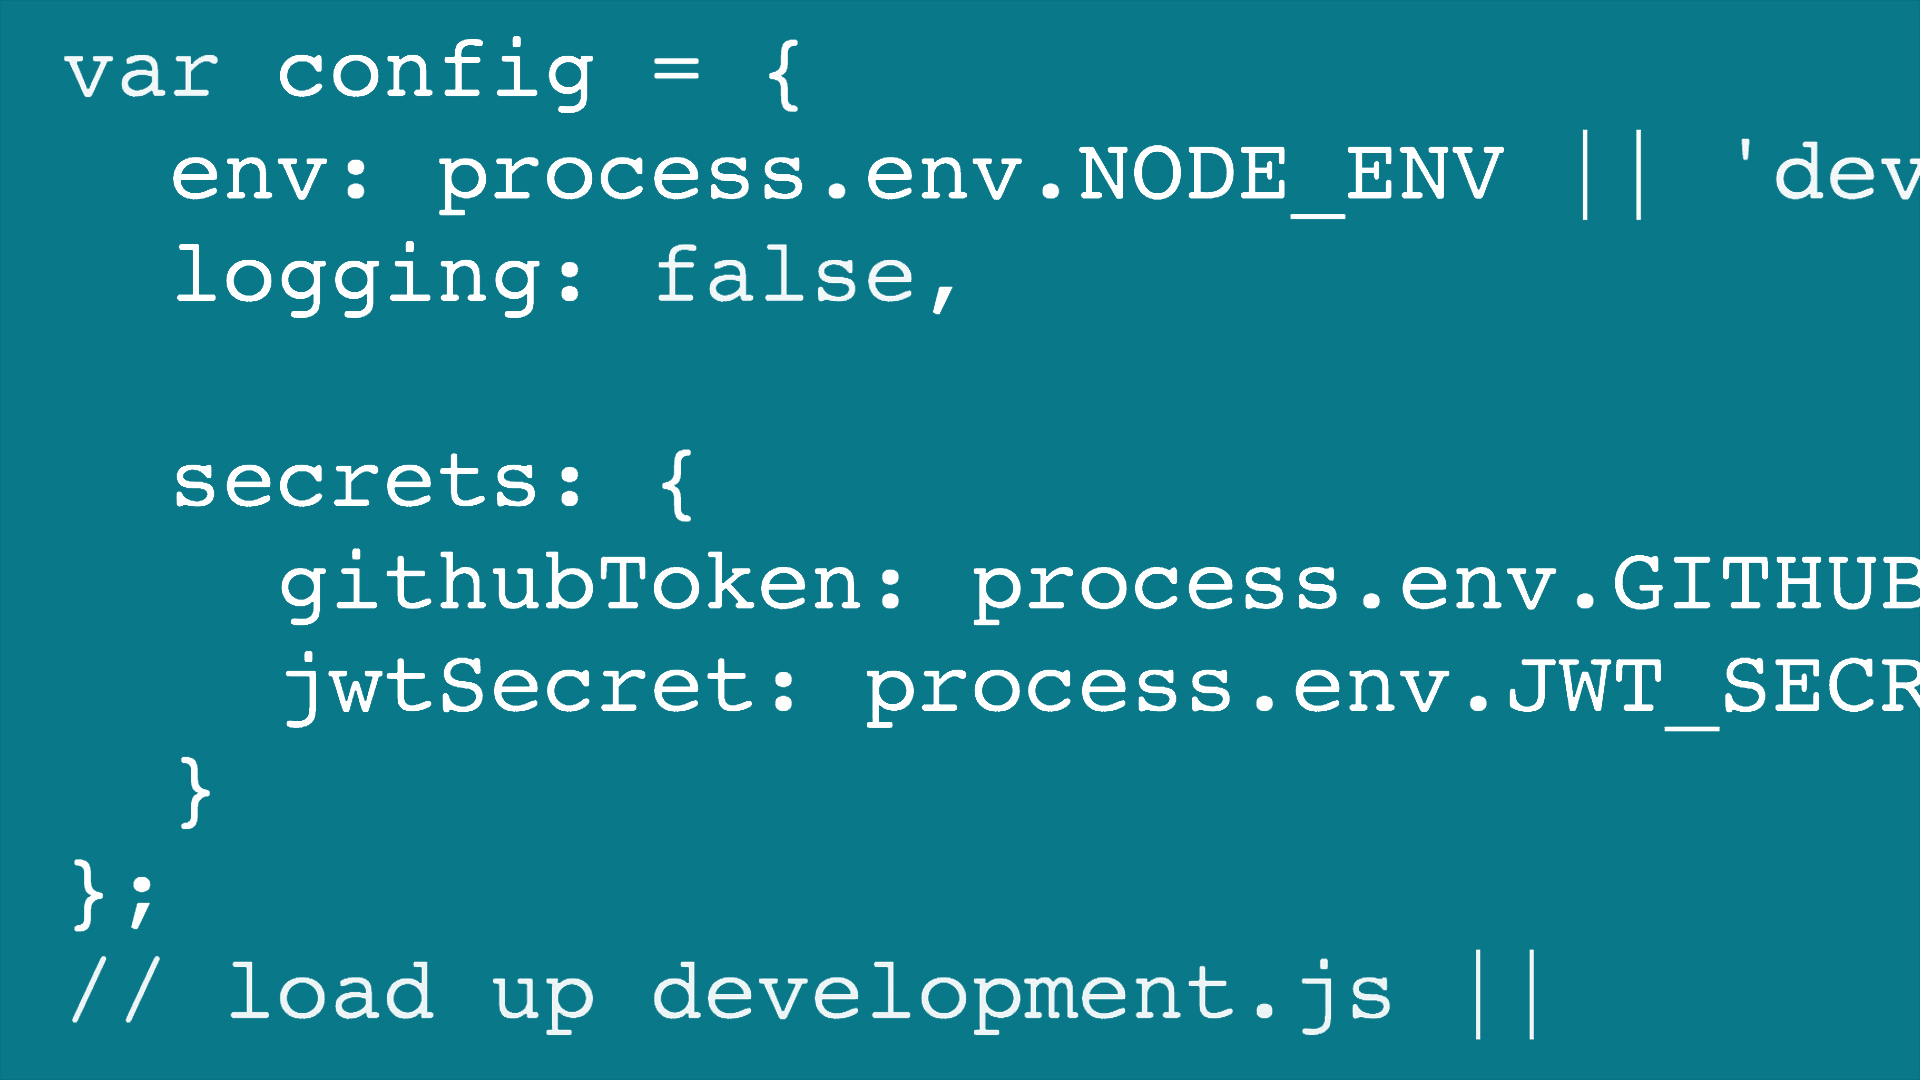 [Lynda] API Design in Node.js Using Express and Mongo